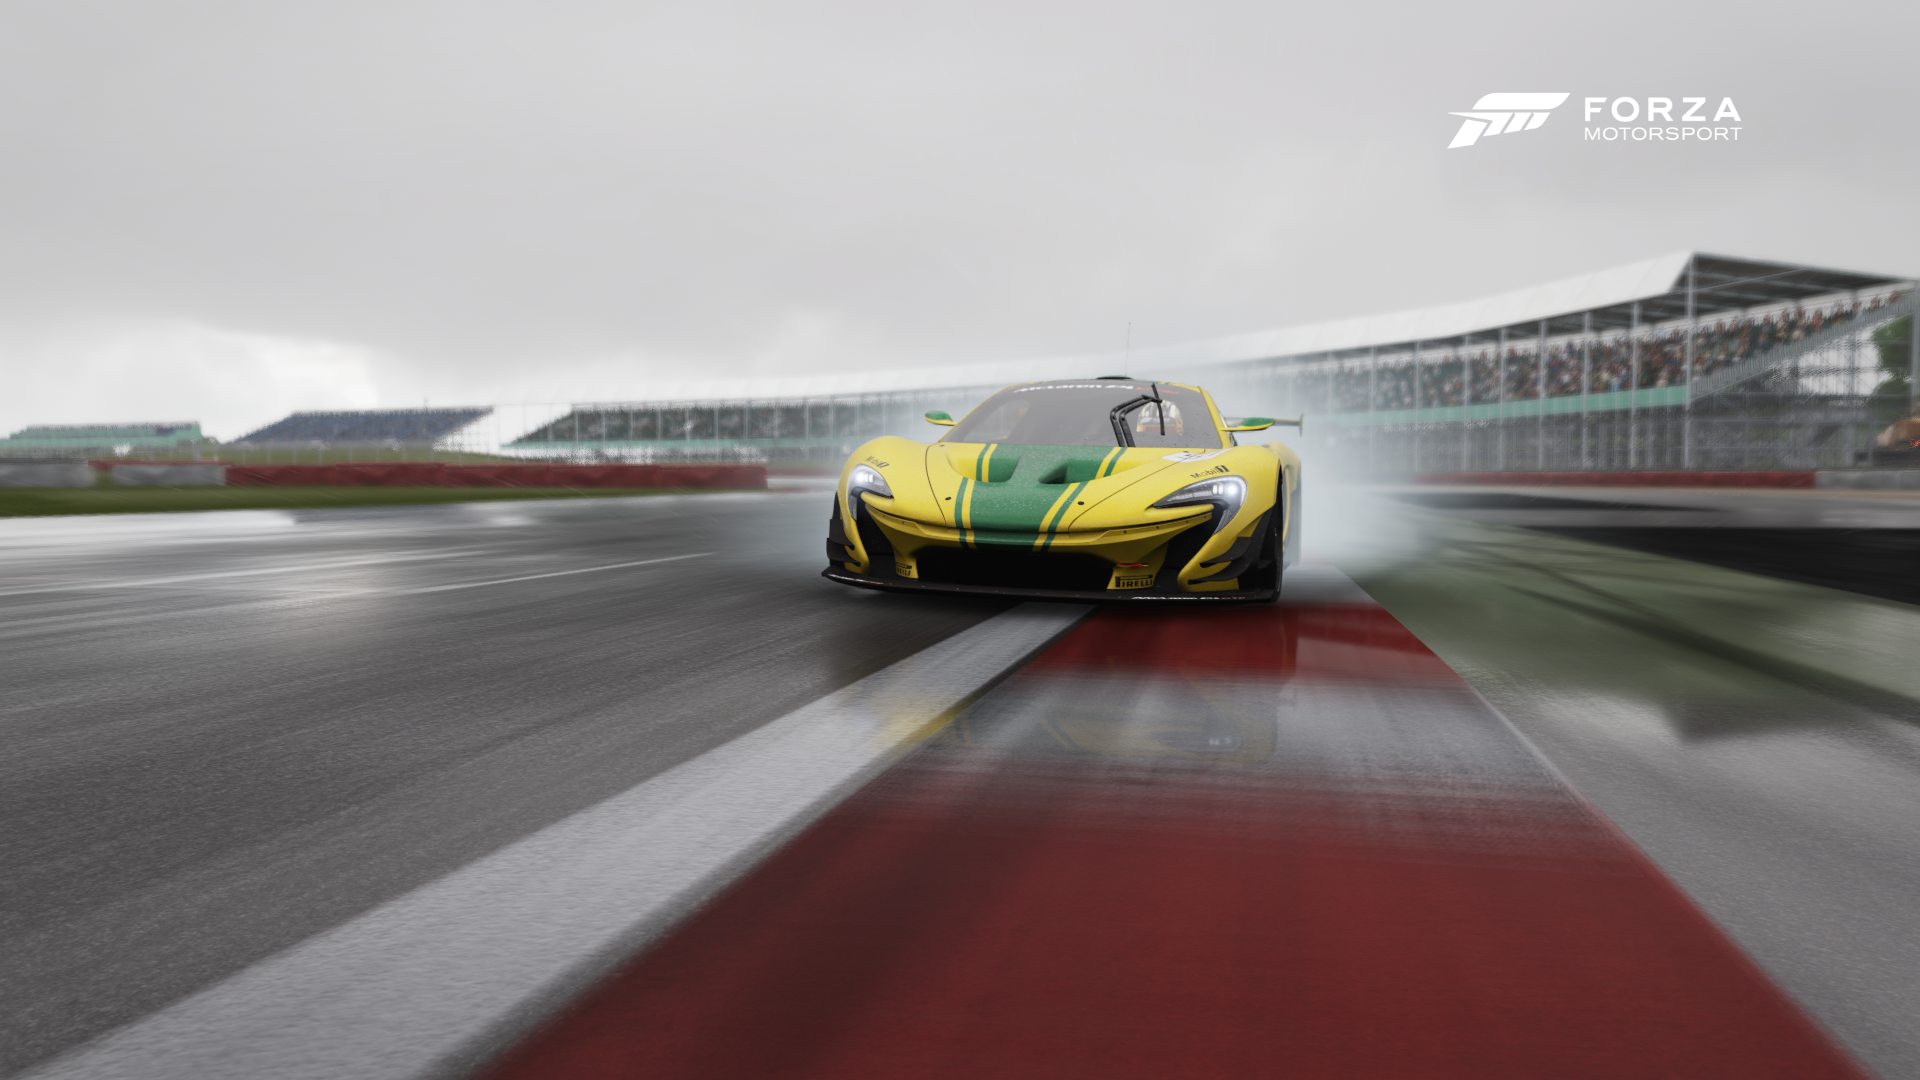 Forza Motorsport 6 (7).png